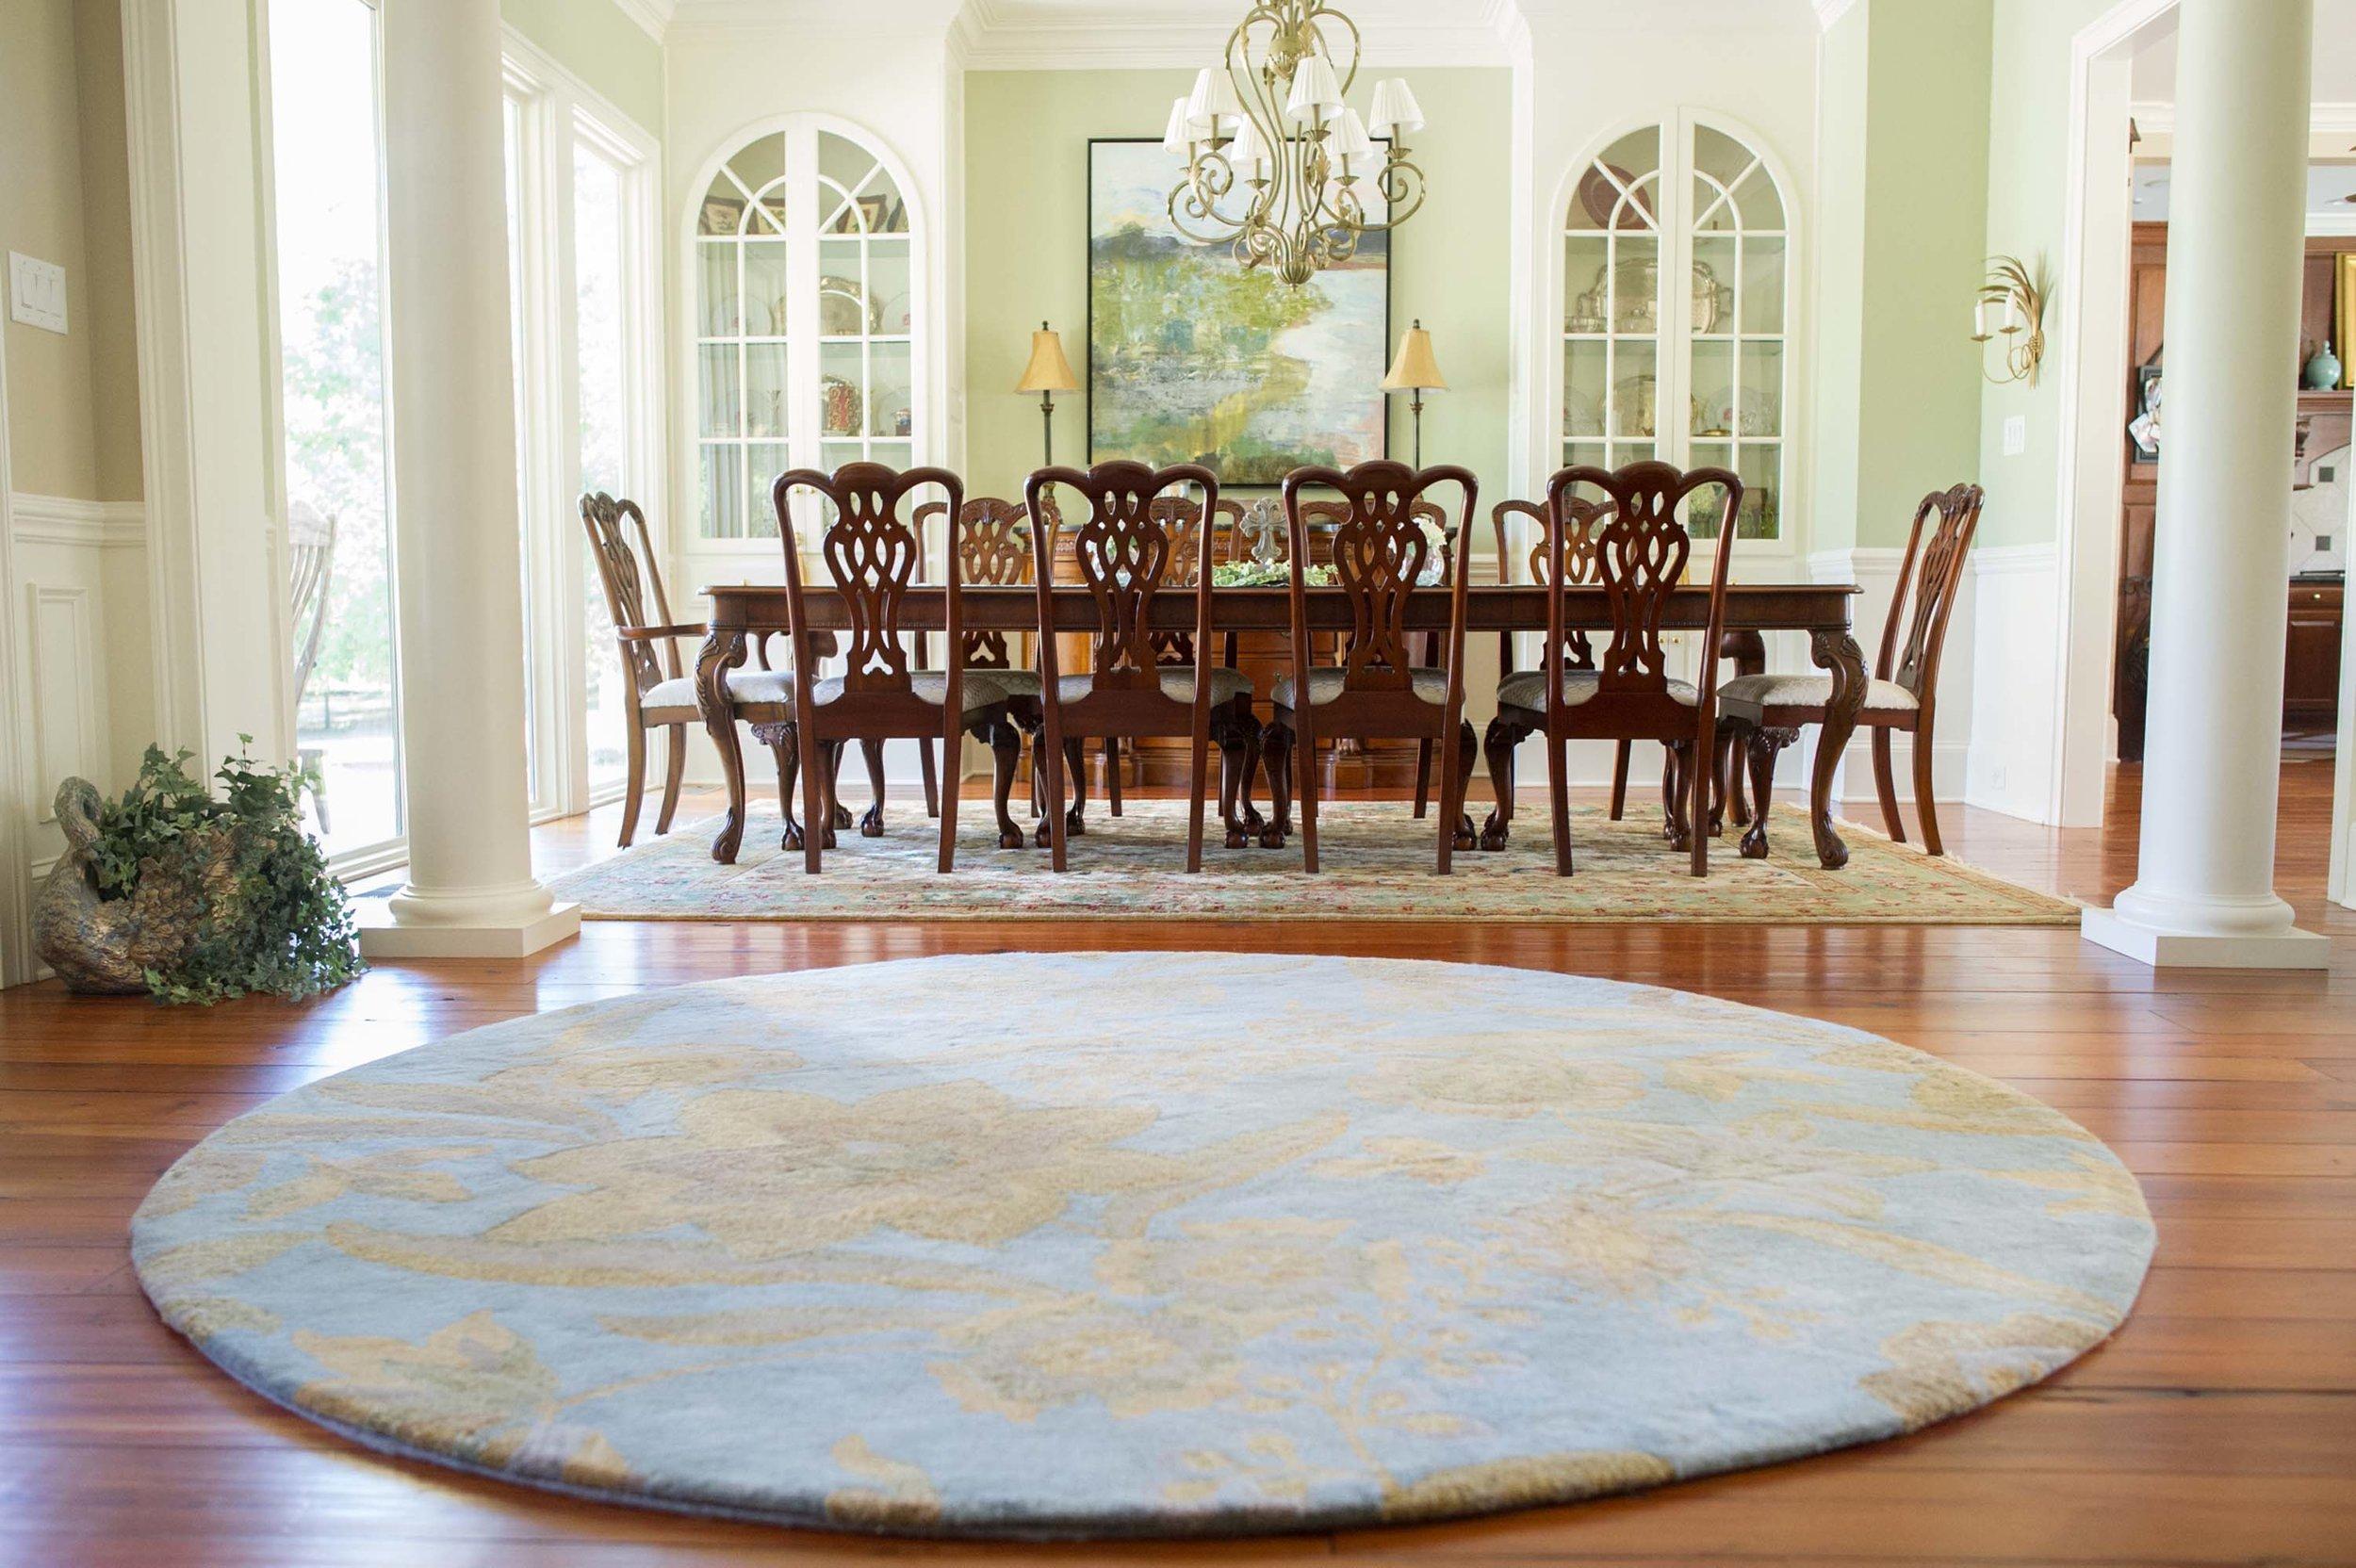 Dining Room with Jaunty Round Rug and Leftbank Artwork